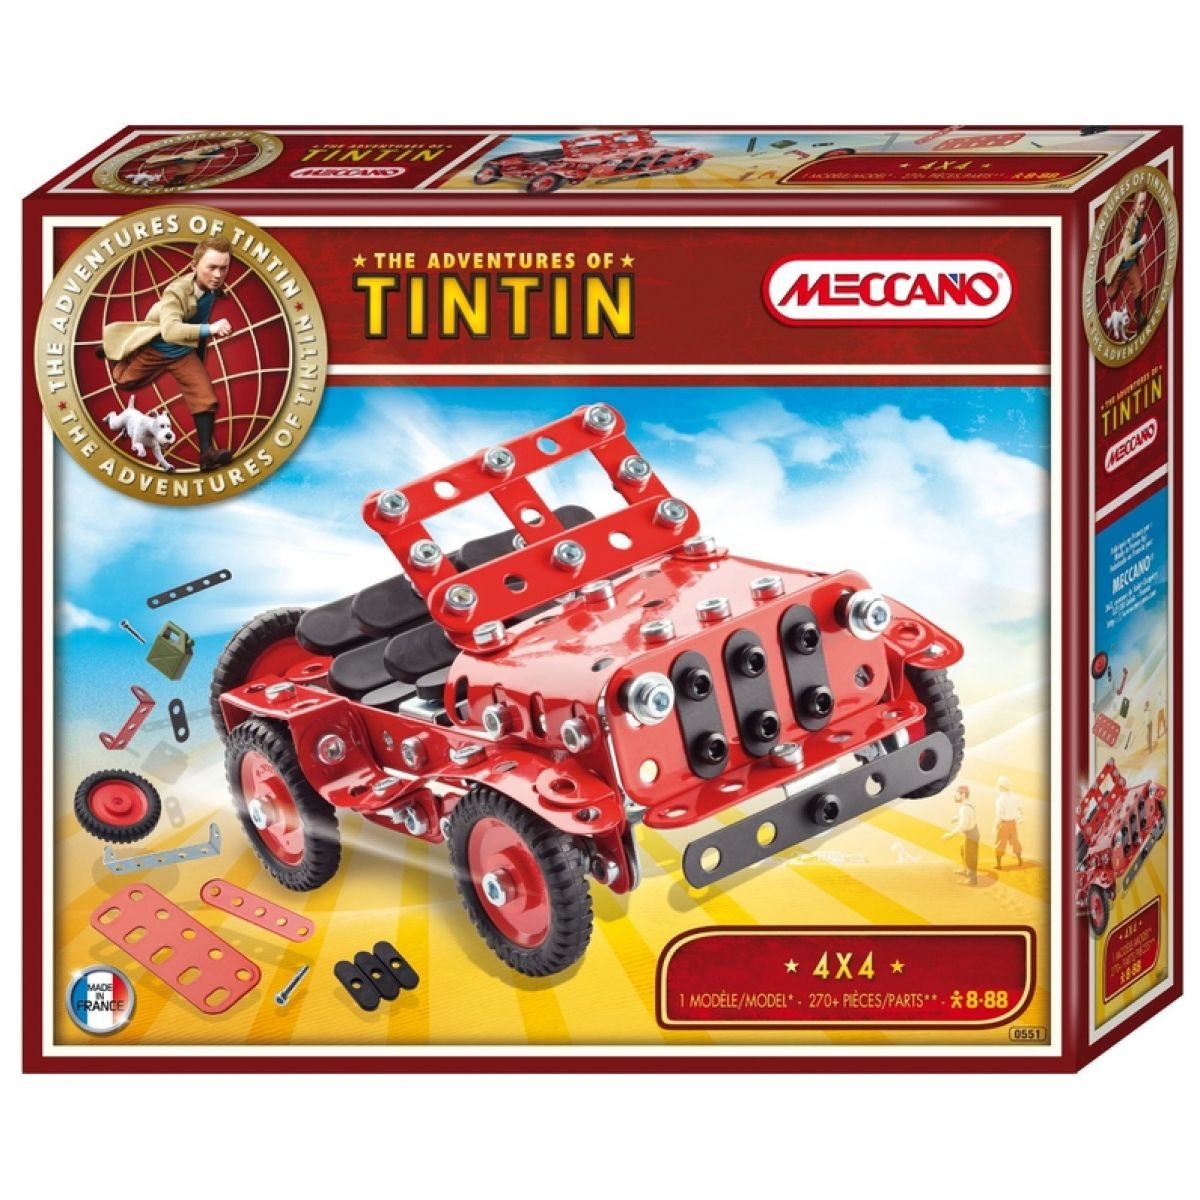 Meccano stavebnice Tintin Jeep 4X4